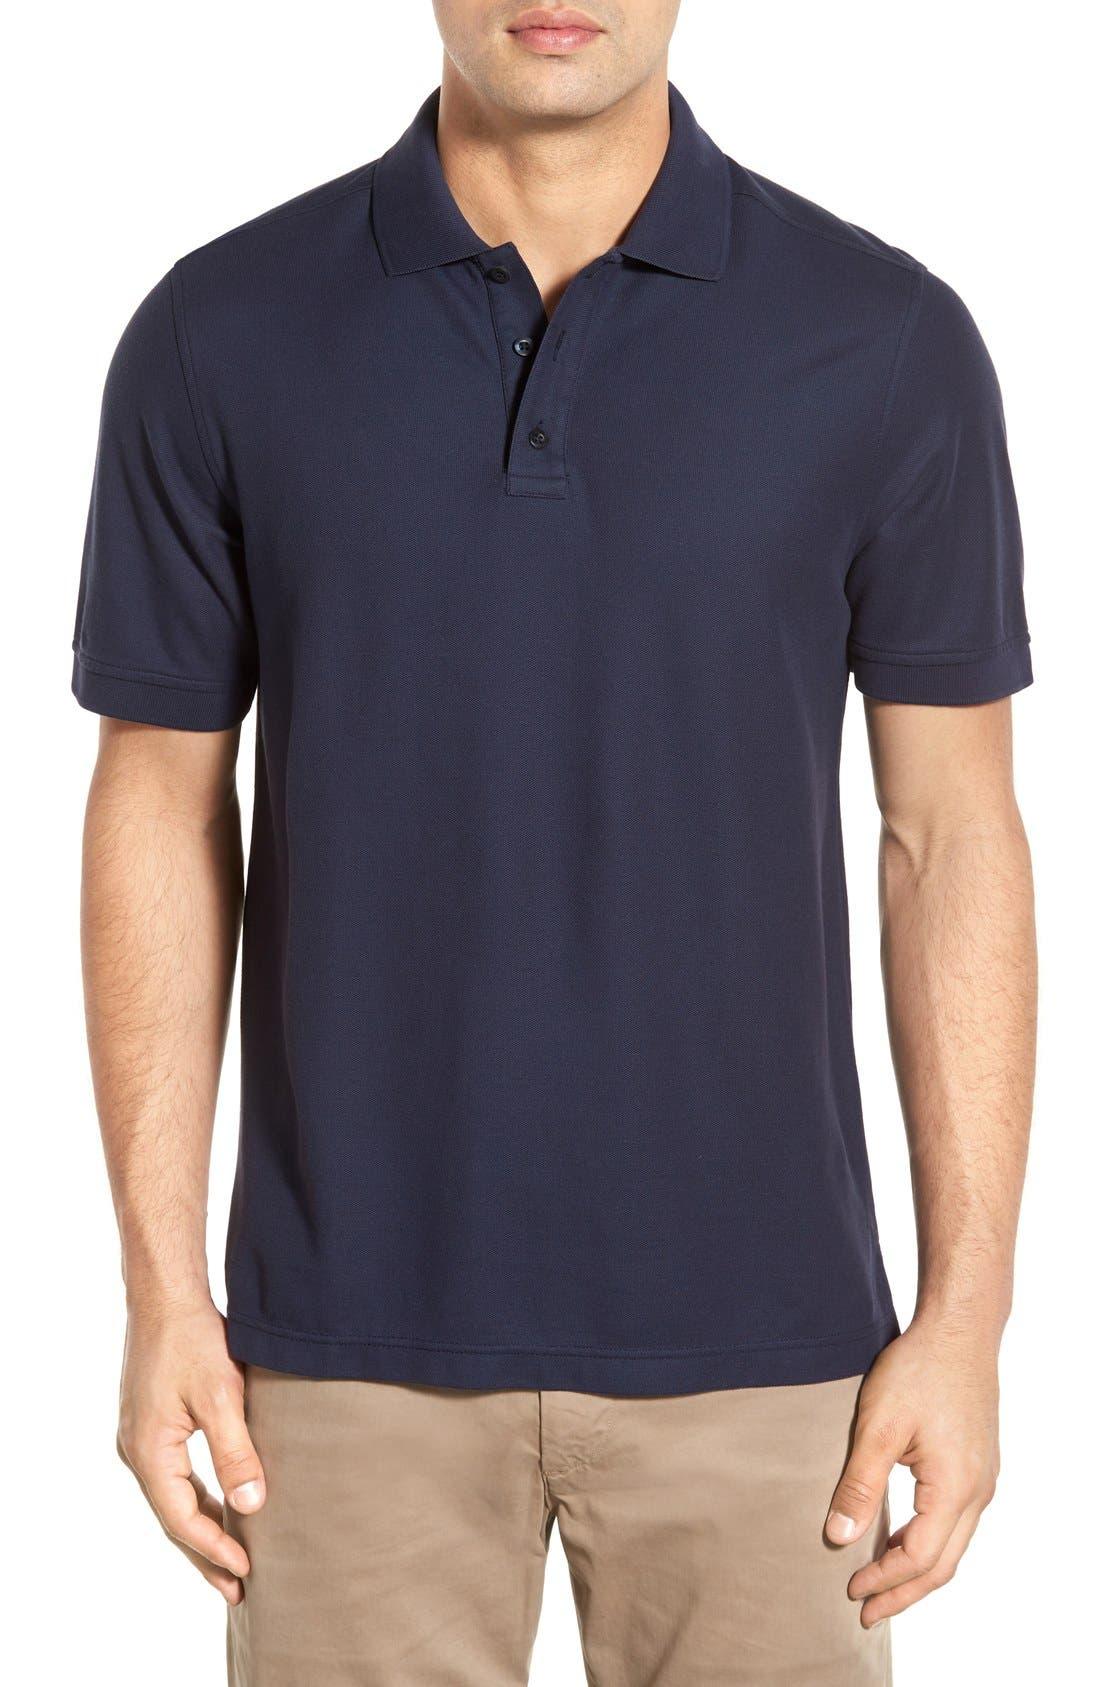 Alternate Image 1 Selected - Nordstrom Men's Shop 'Classic' Regular Fit Piqué Polo